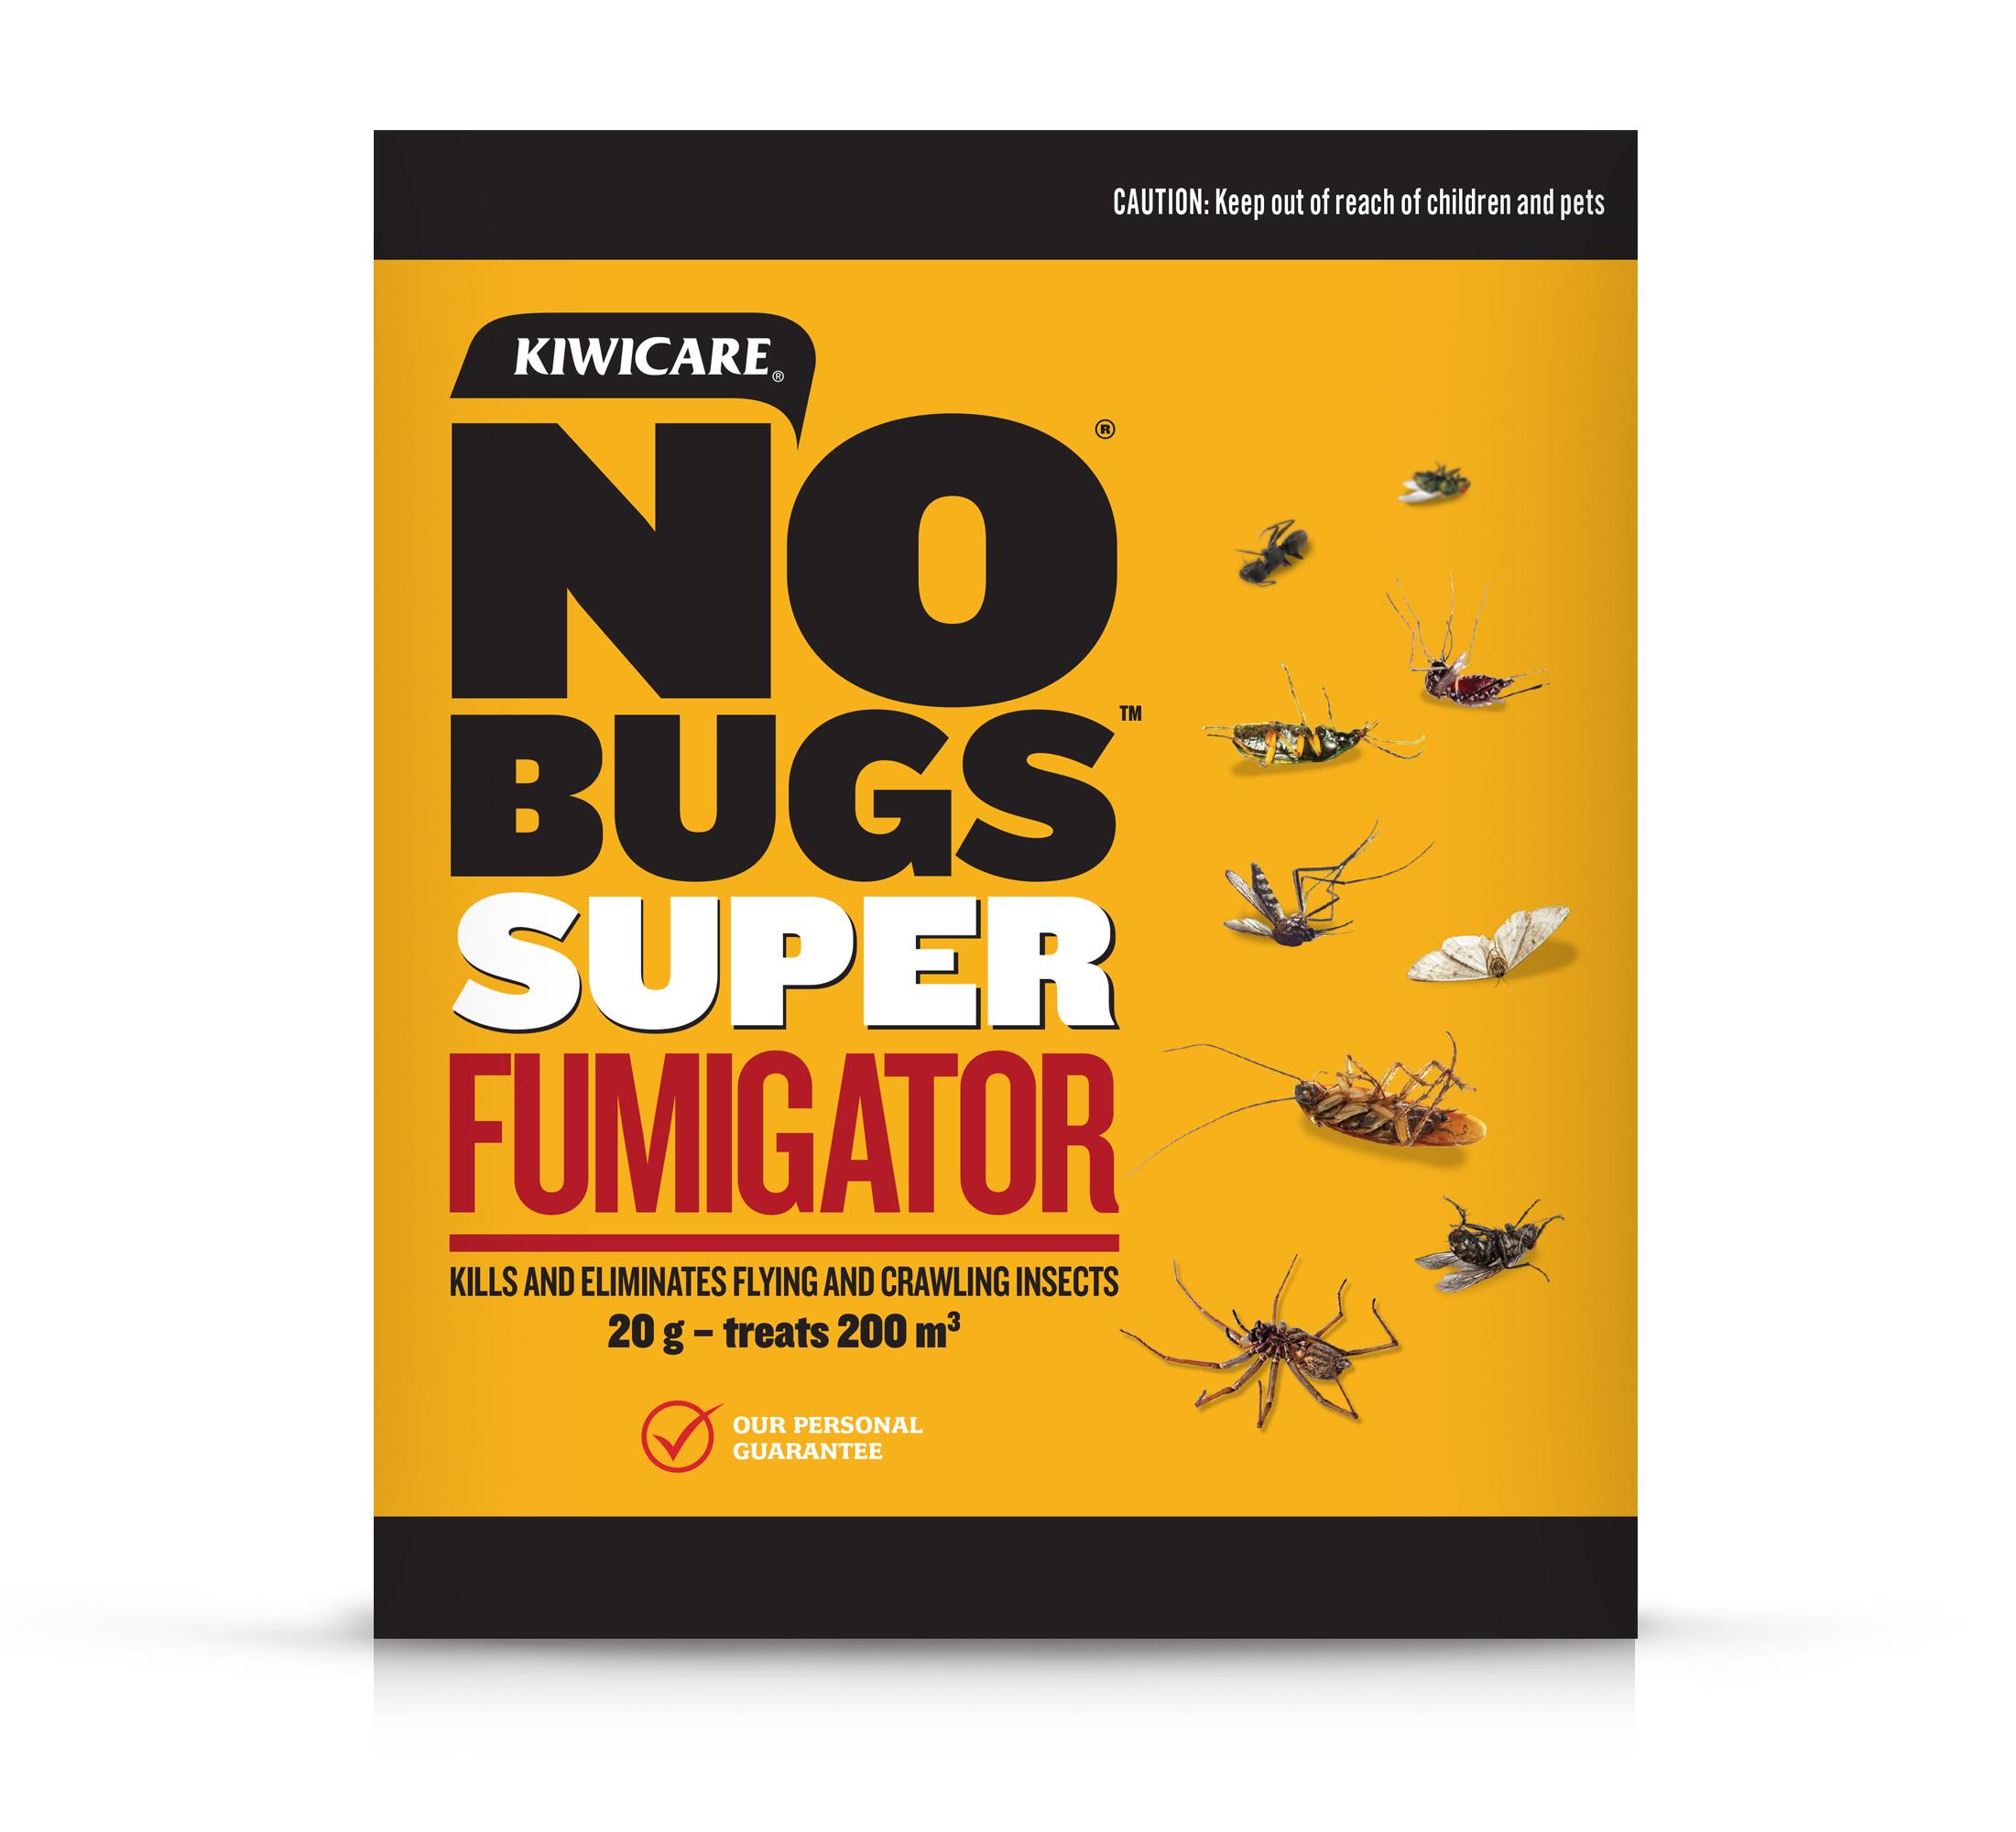 No Bug Super Fumigator Control Of Borer And Bugs